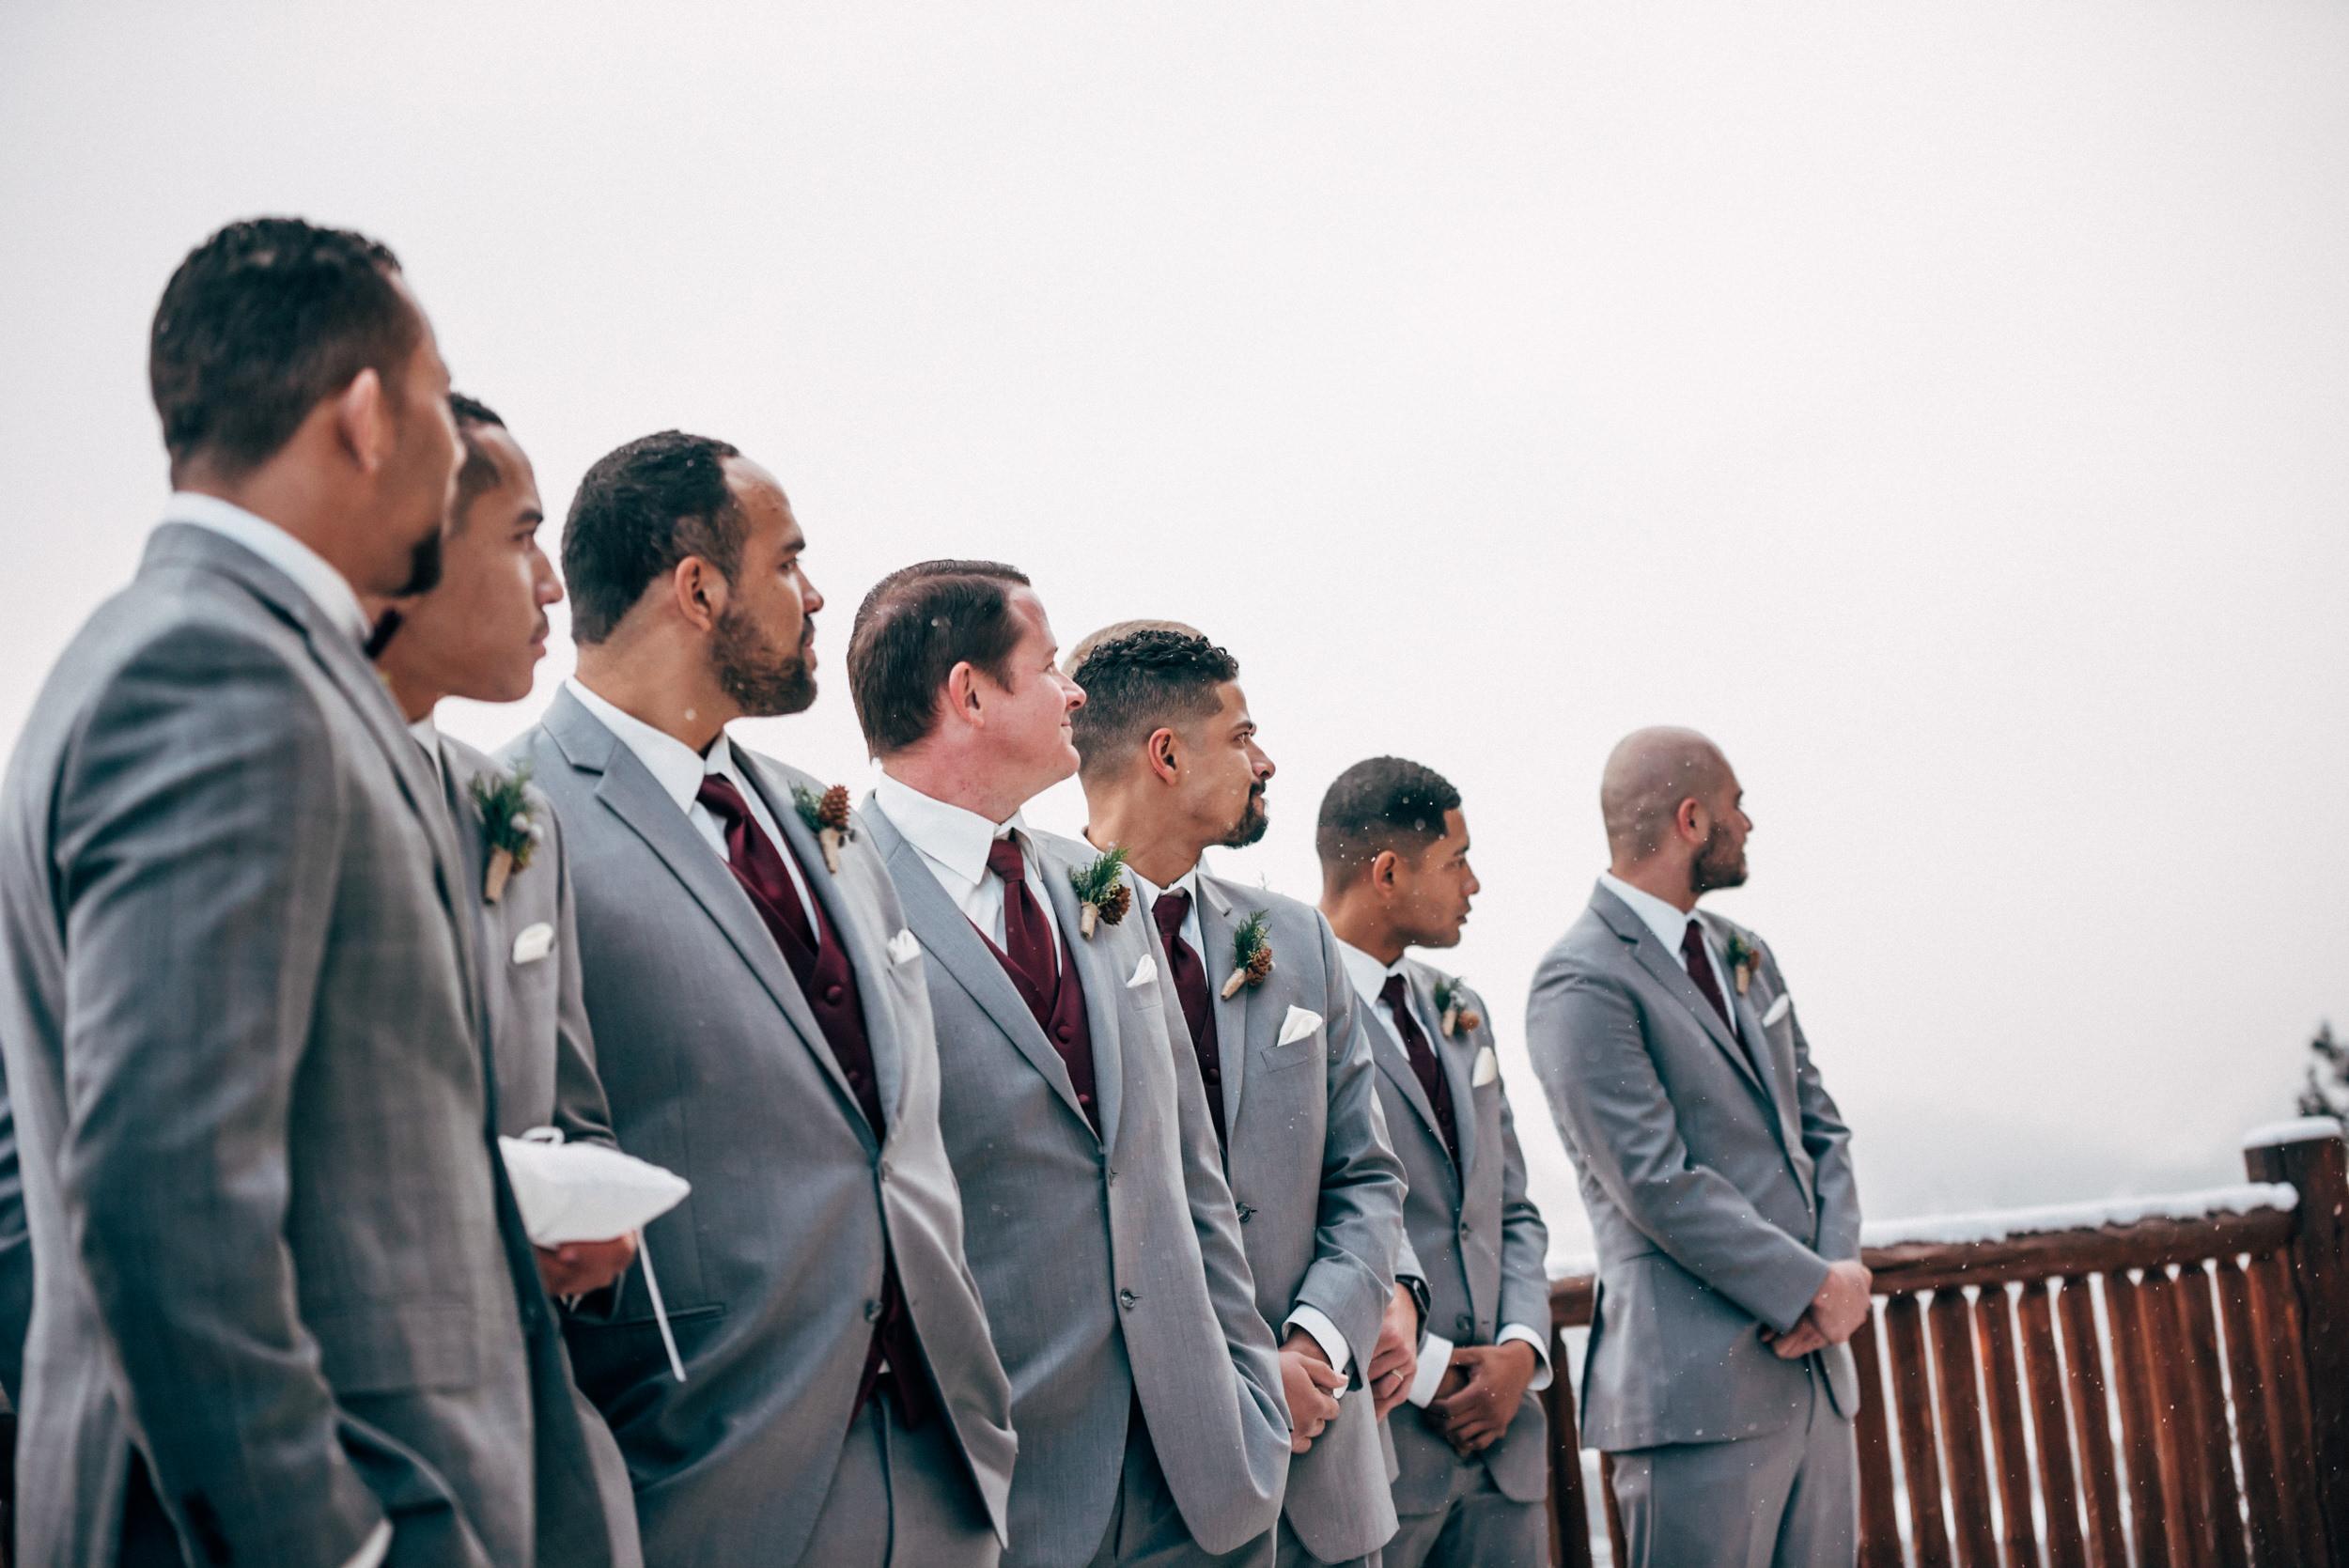 Groomen's men at Breckenridge ceremony. Colorado wedding photographer.